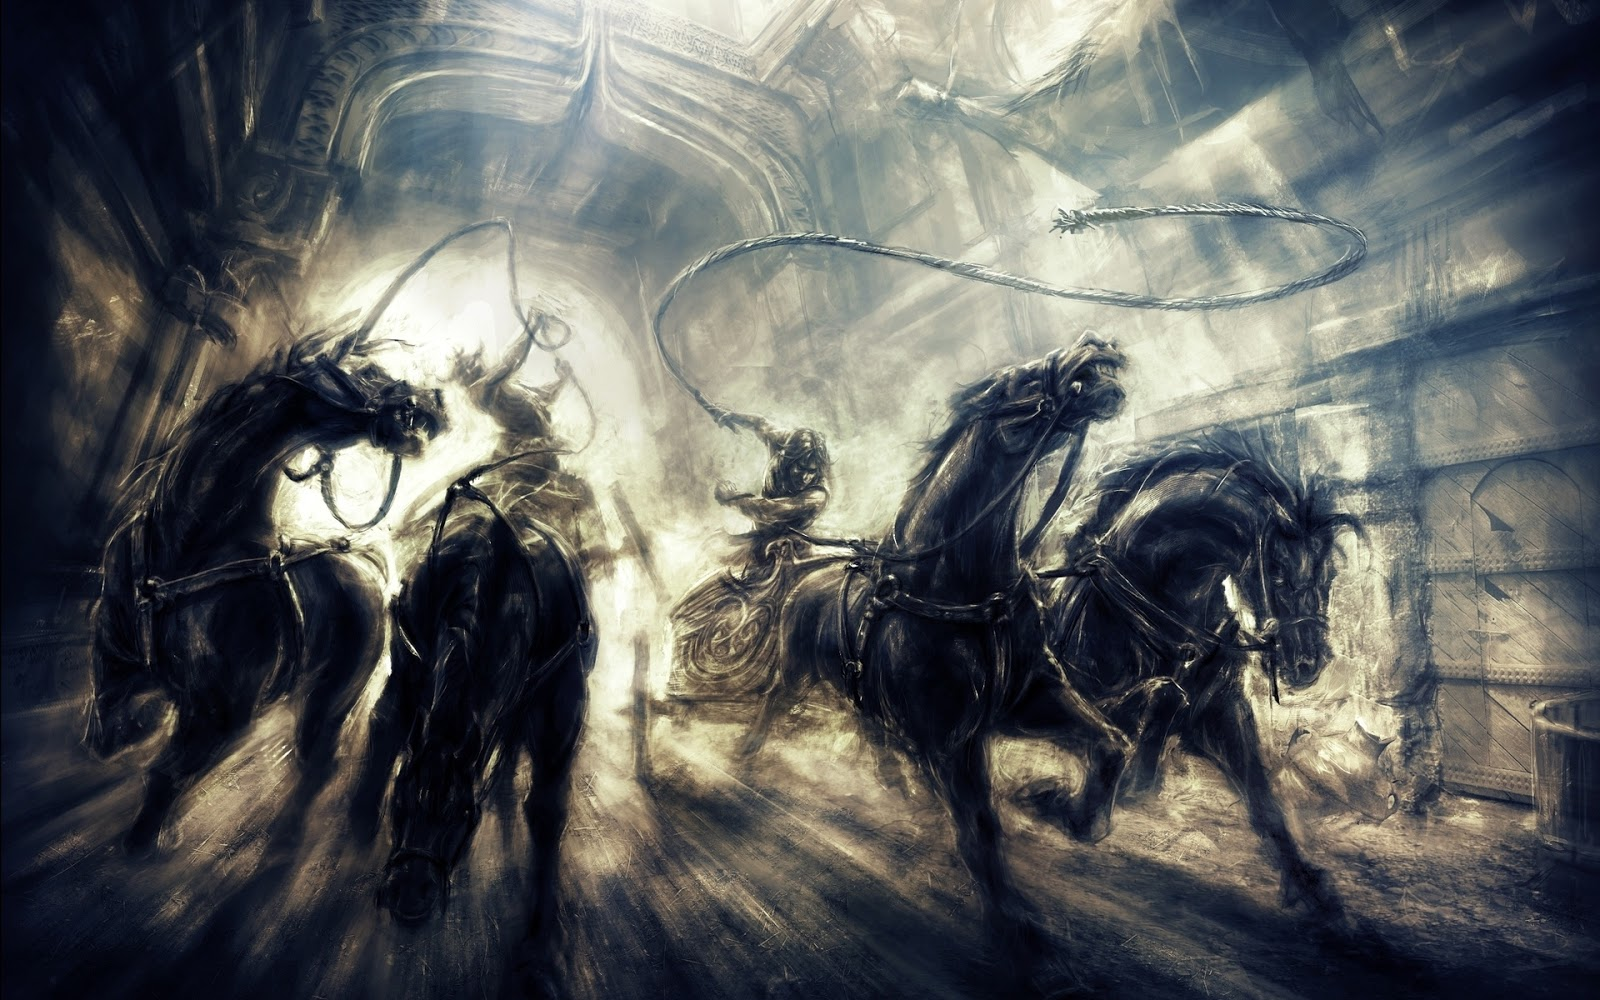 Good   Wallpaper Horse Warrior - Games+HD+Wallpapers_Downloadha+(15)  2018_154624.jpg